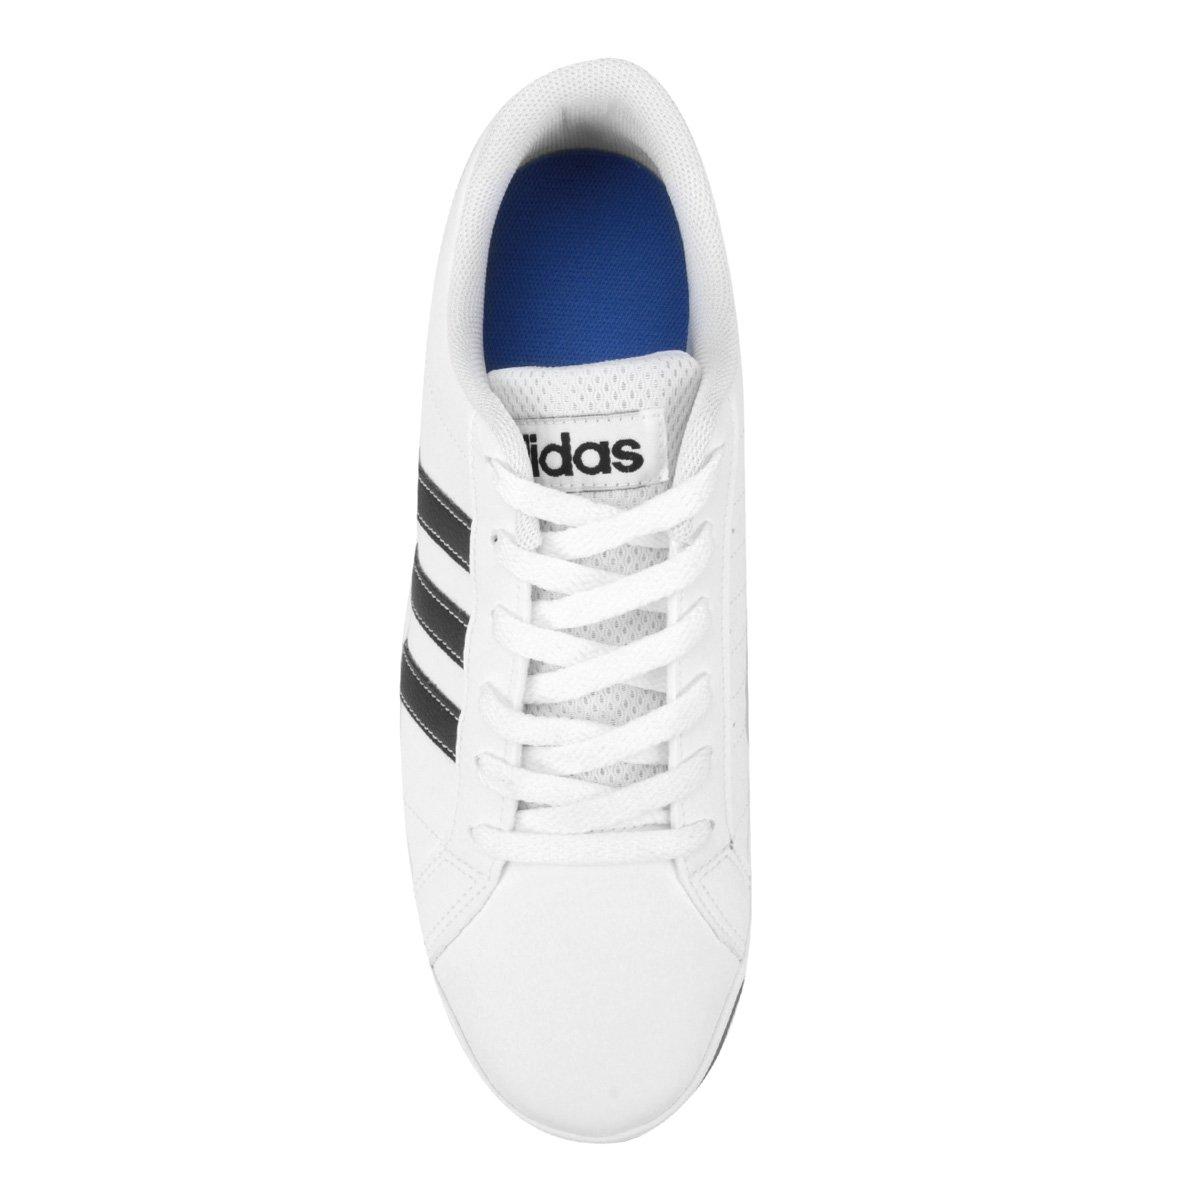 Tênis Adidas Pace Vs Masculino - Branco e Preto - Compre Agora ... d84971c3fd429